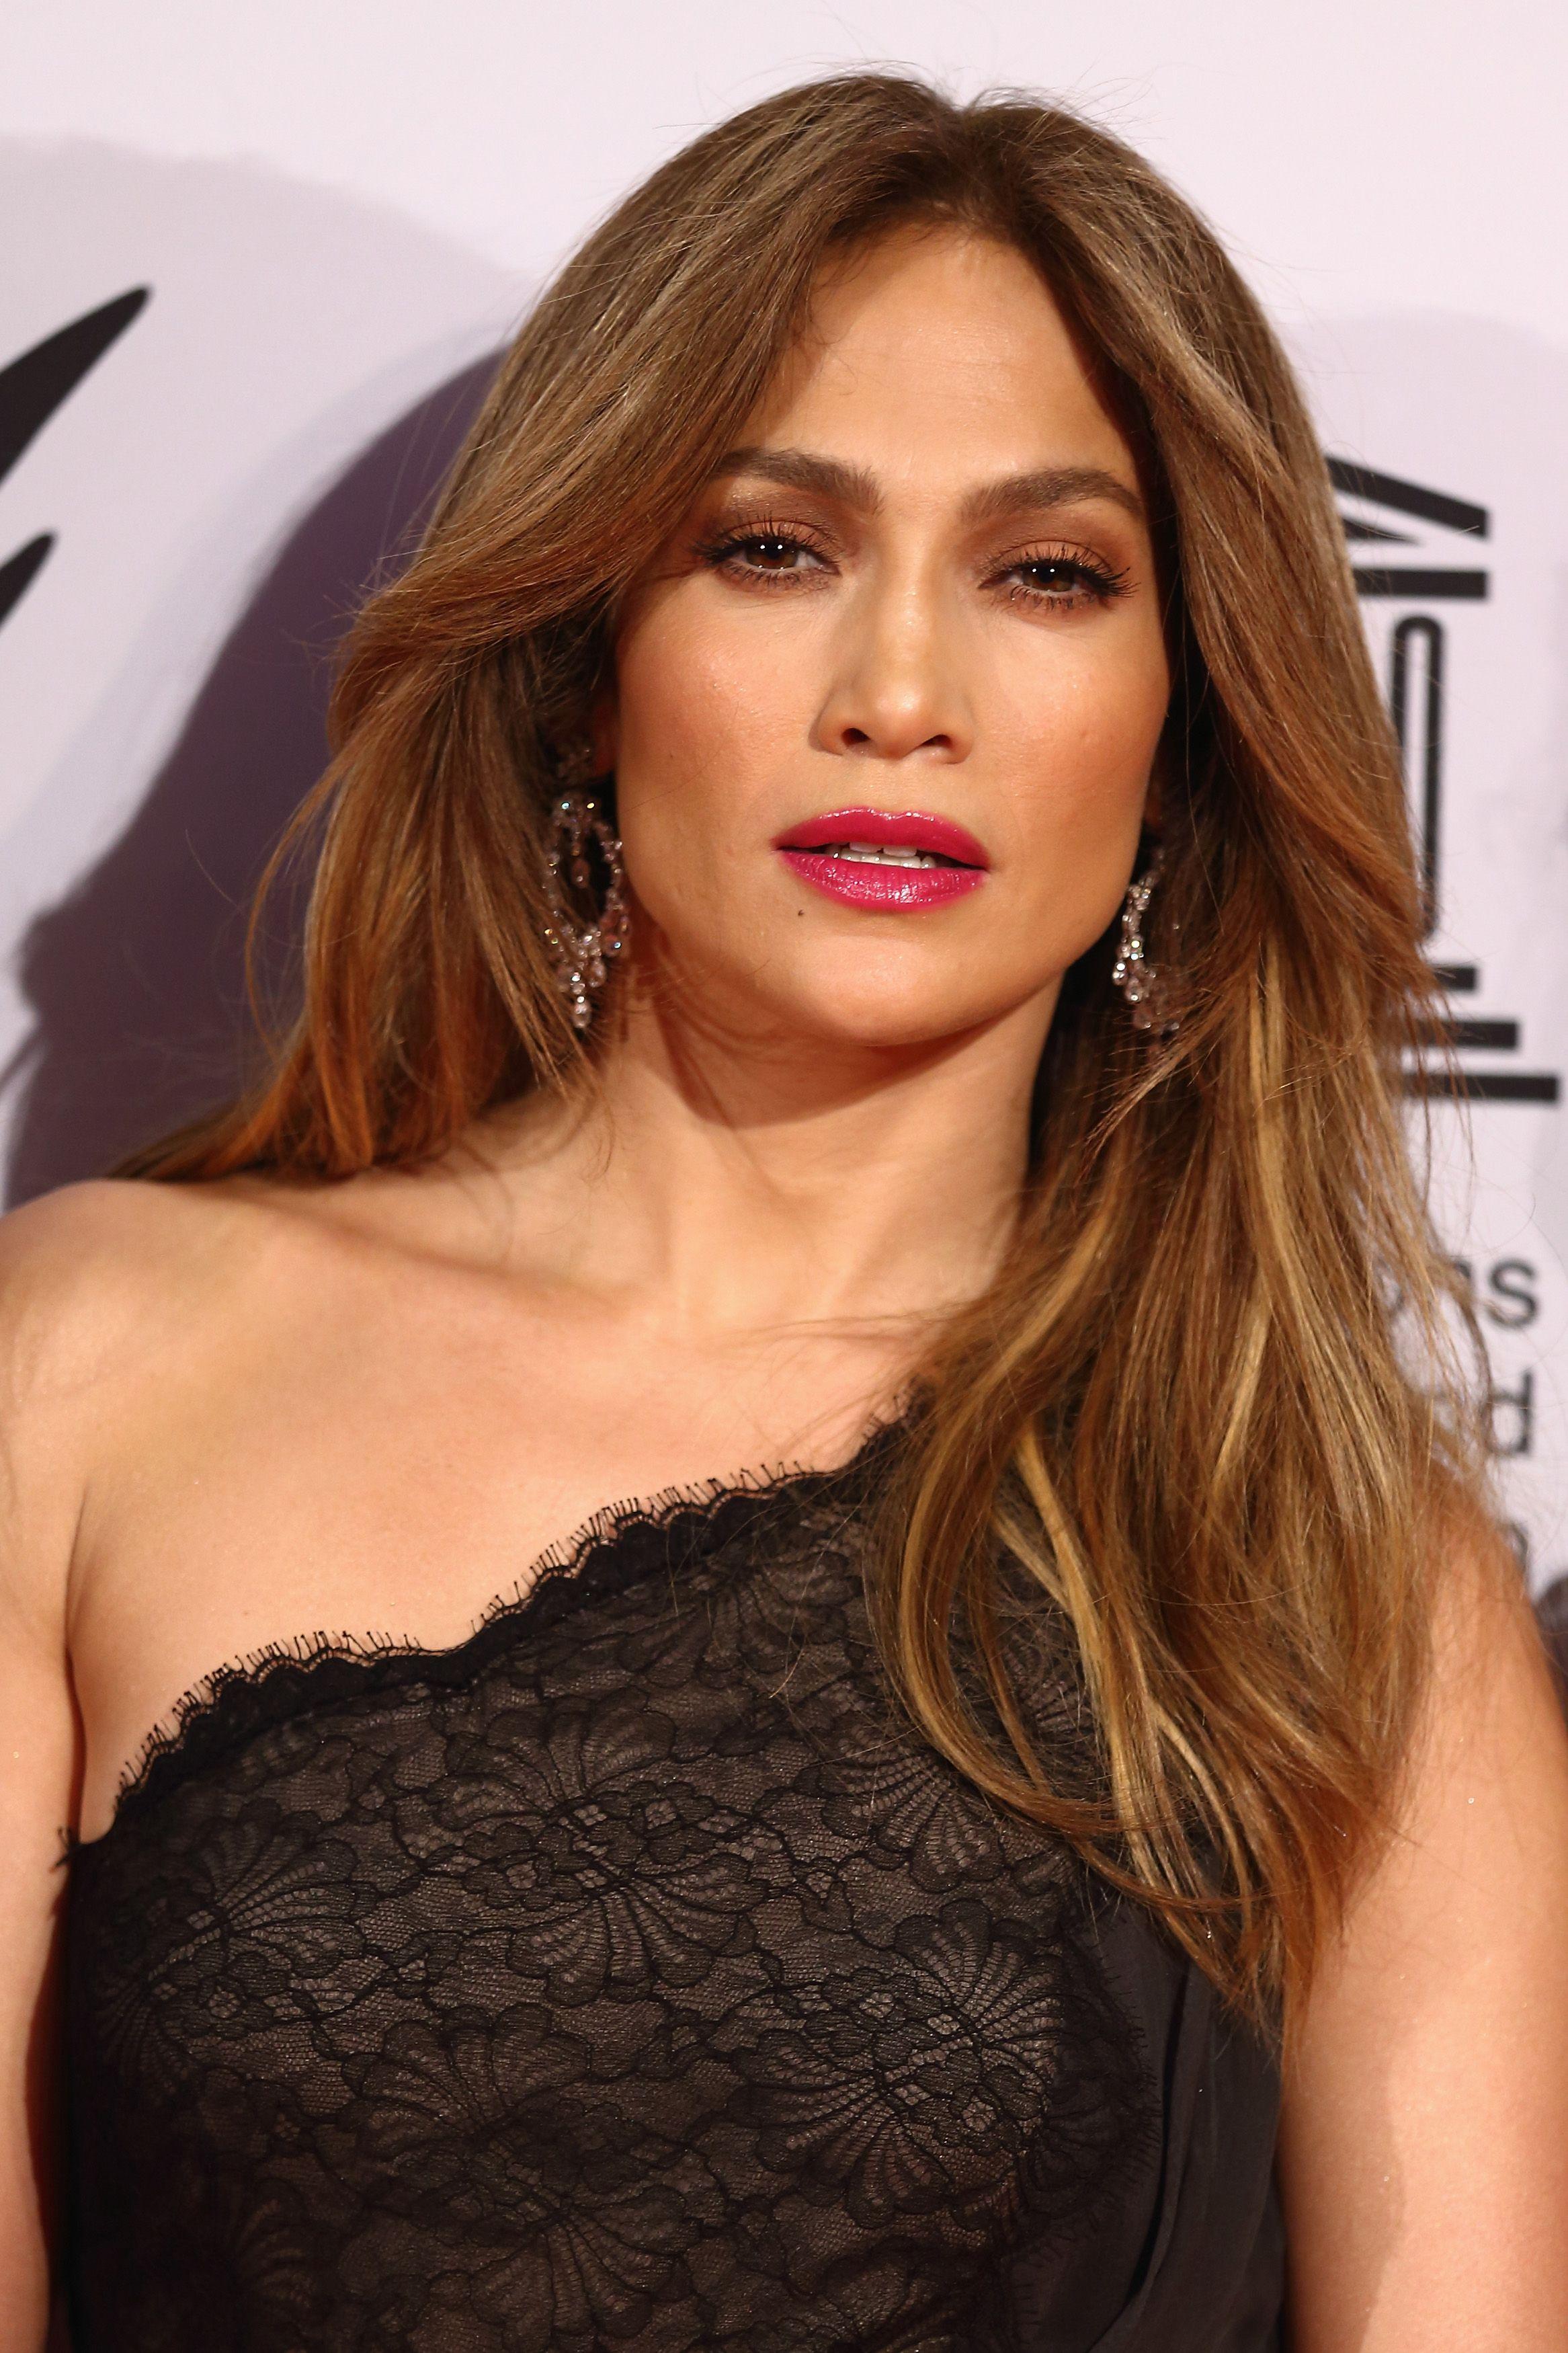 Female Celebrities With Light Brown Hair pertaining to 25 dark brown hair colors - celebrities with dark hair